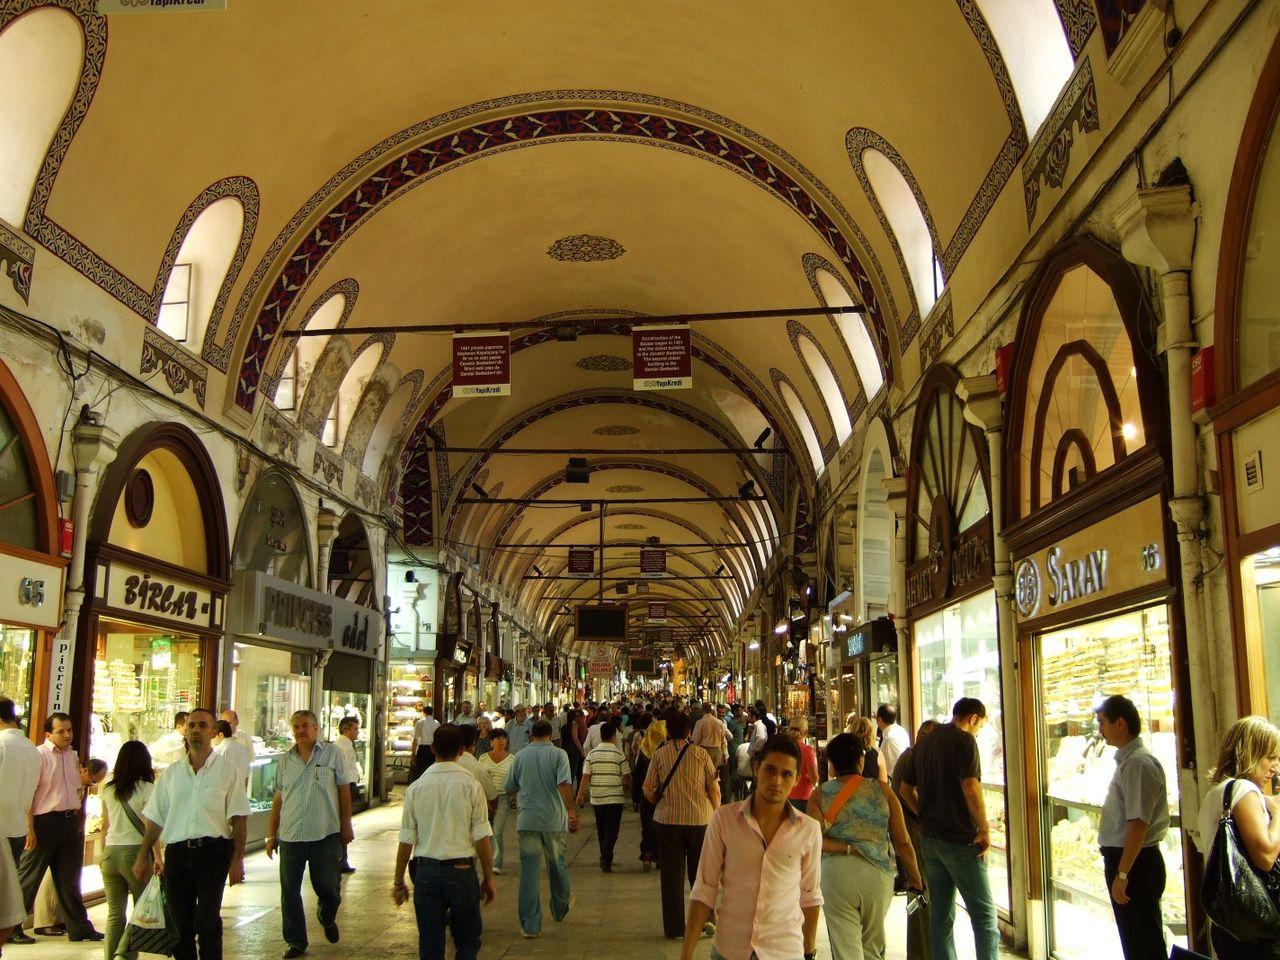 Velký bazar, en.wikipedia.org